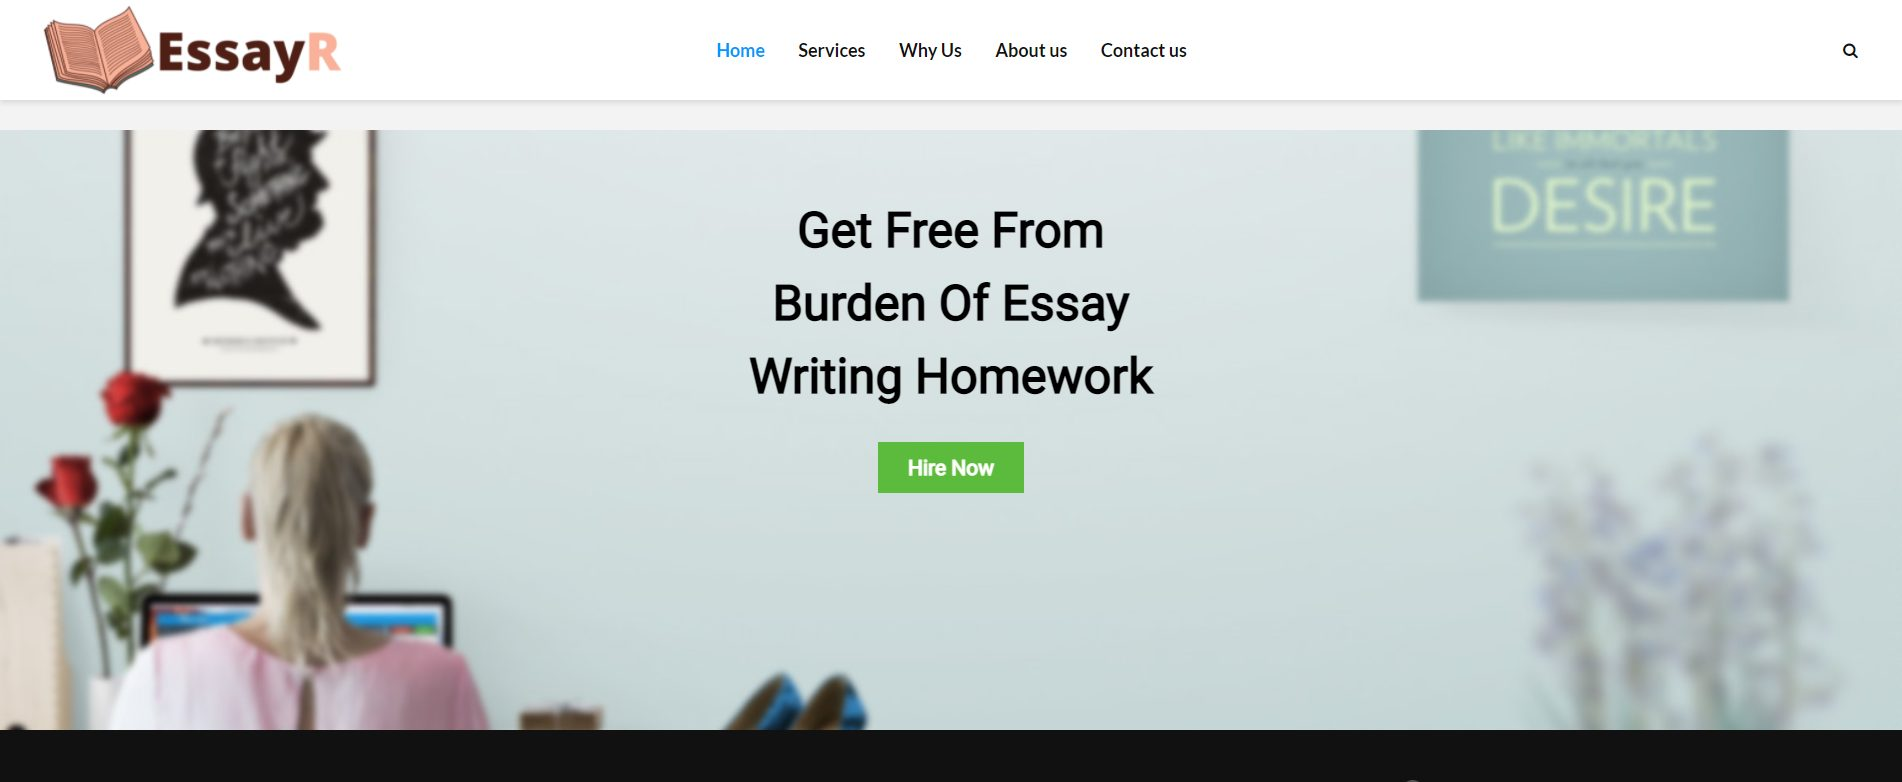 essayr - Best essay writing service